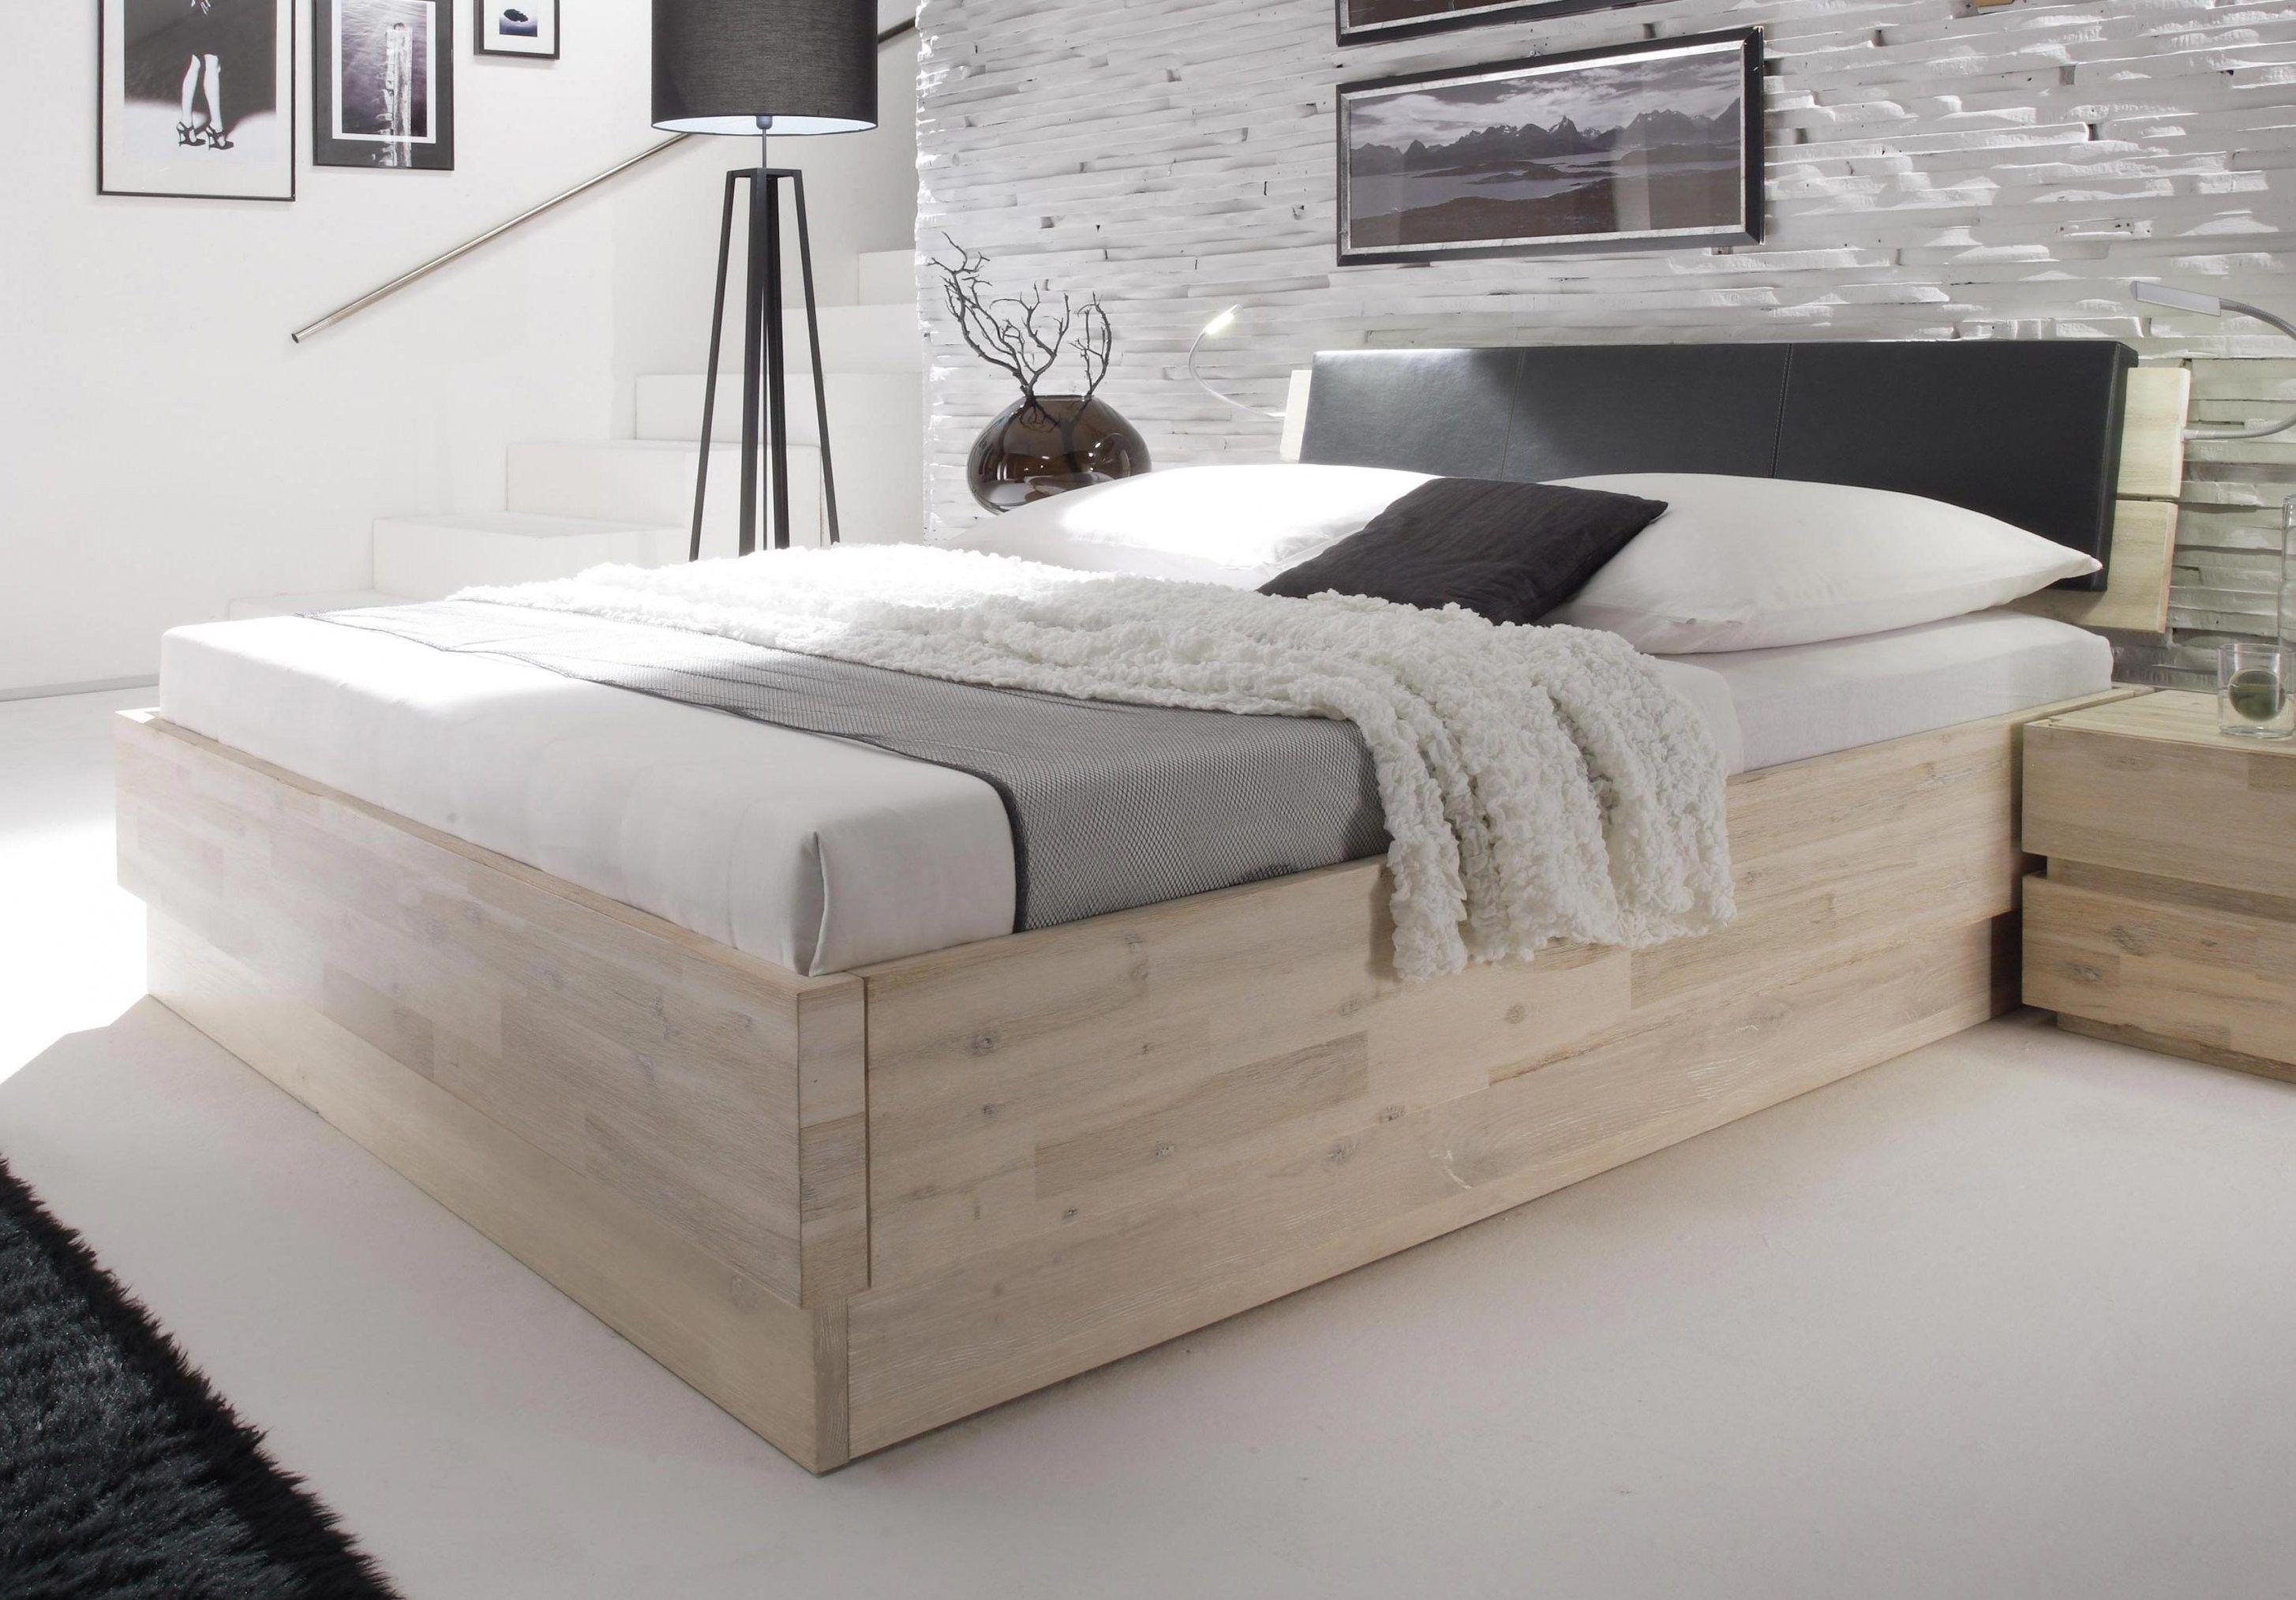 Bett 200x200 Komforthohe Bemerkenswert Auf Kreative Deko Ideen Mit Von Bett 200x200 Komforthohe In 2020 Bett 180x200 Designer Bett Bett Selber Bauen